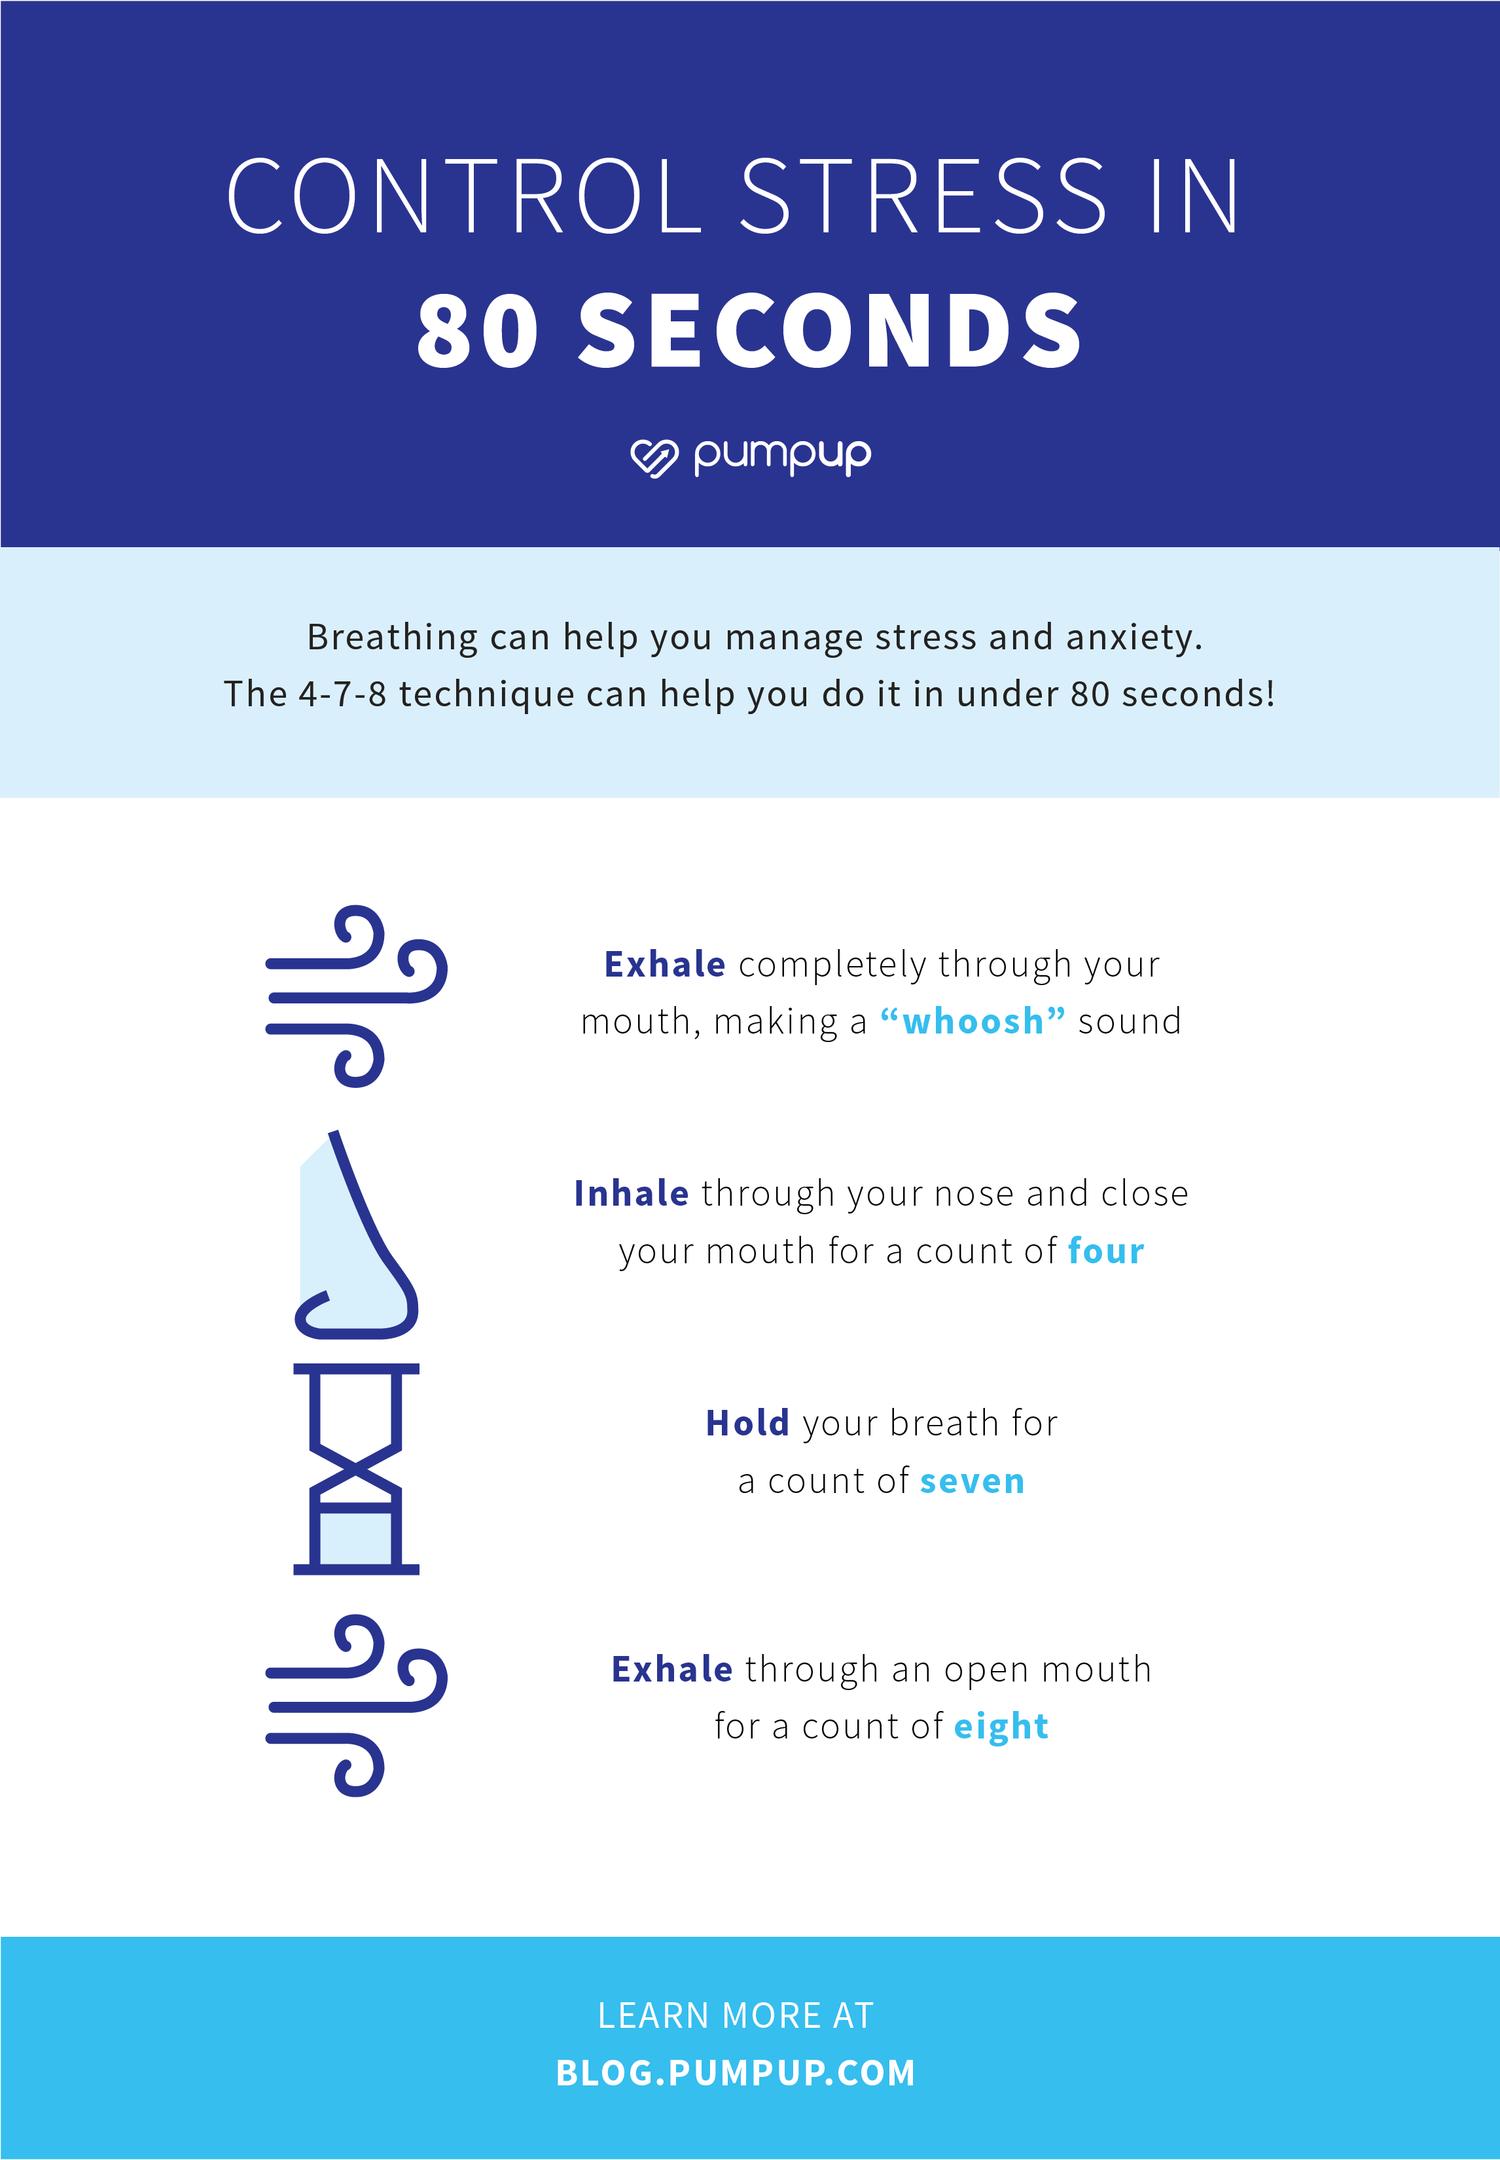 Control stress 80 seconds